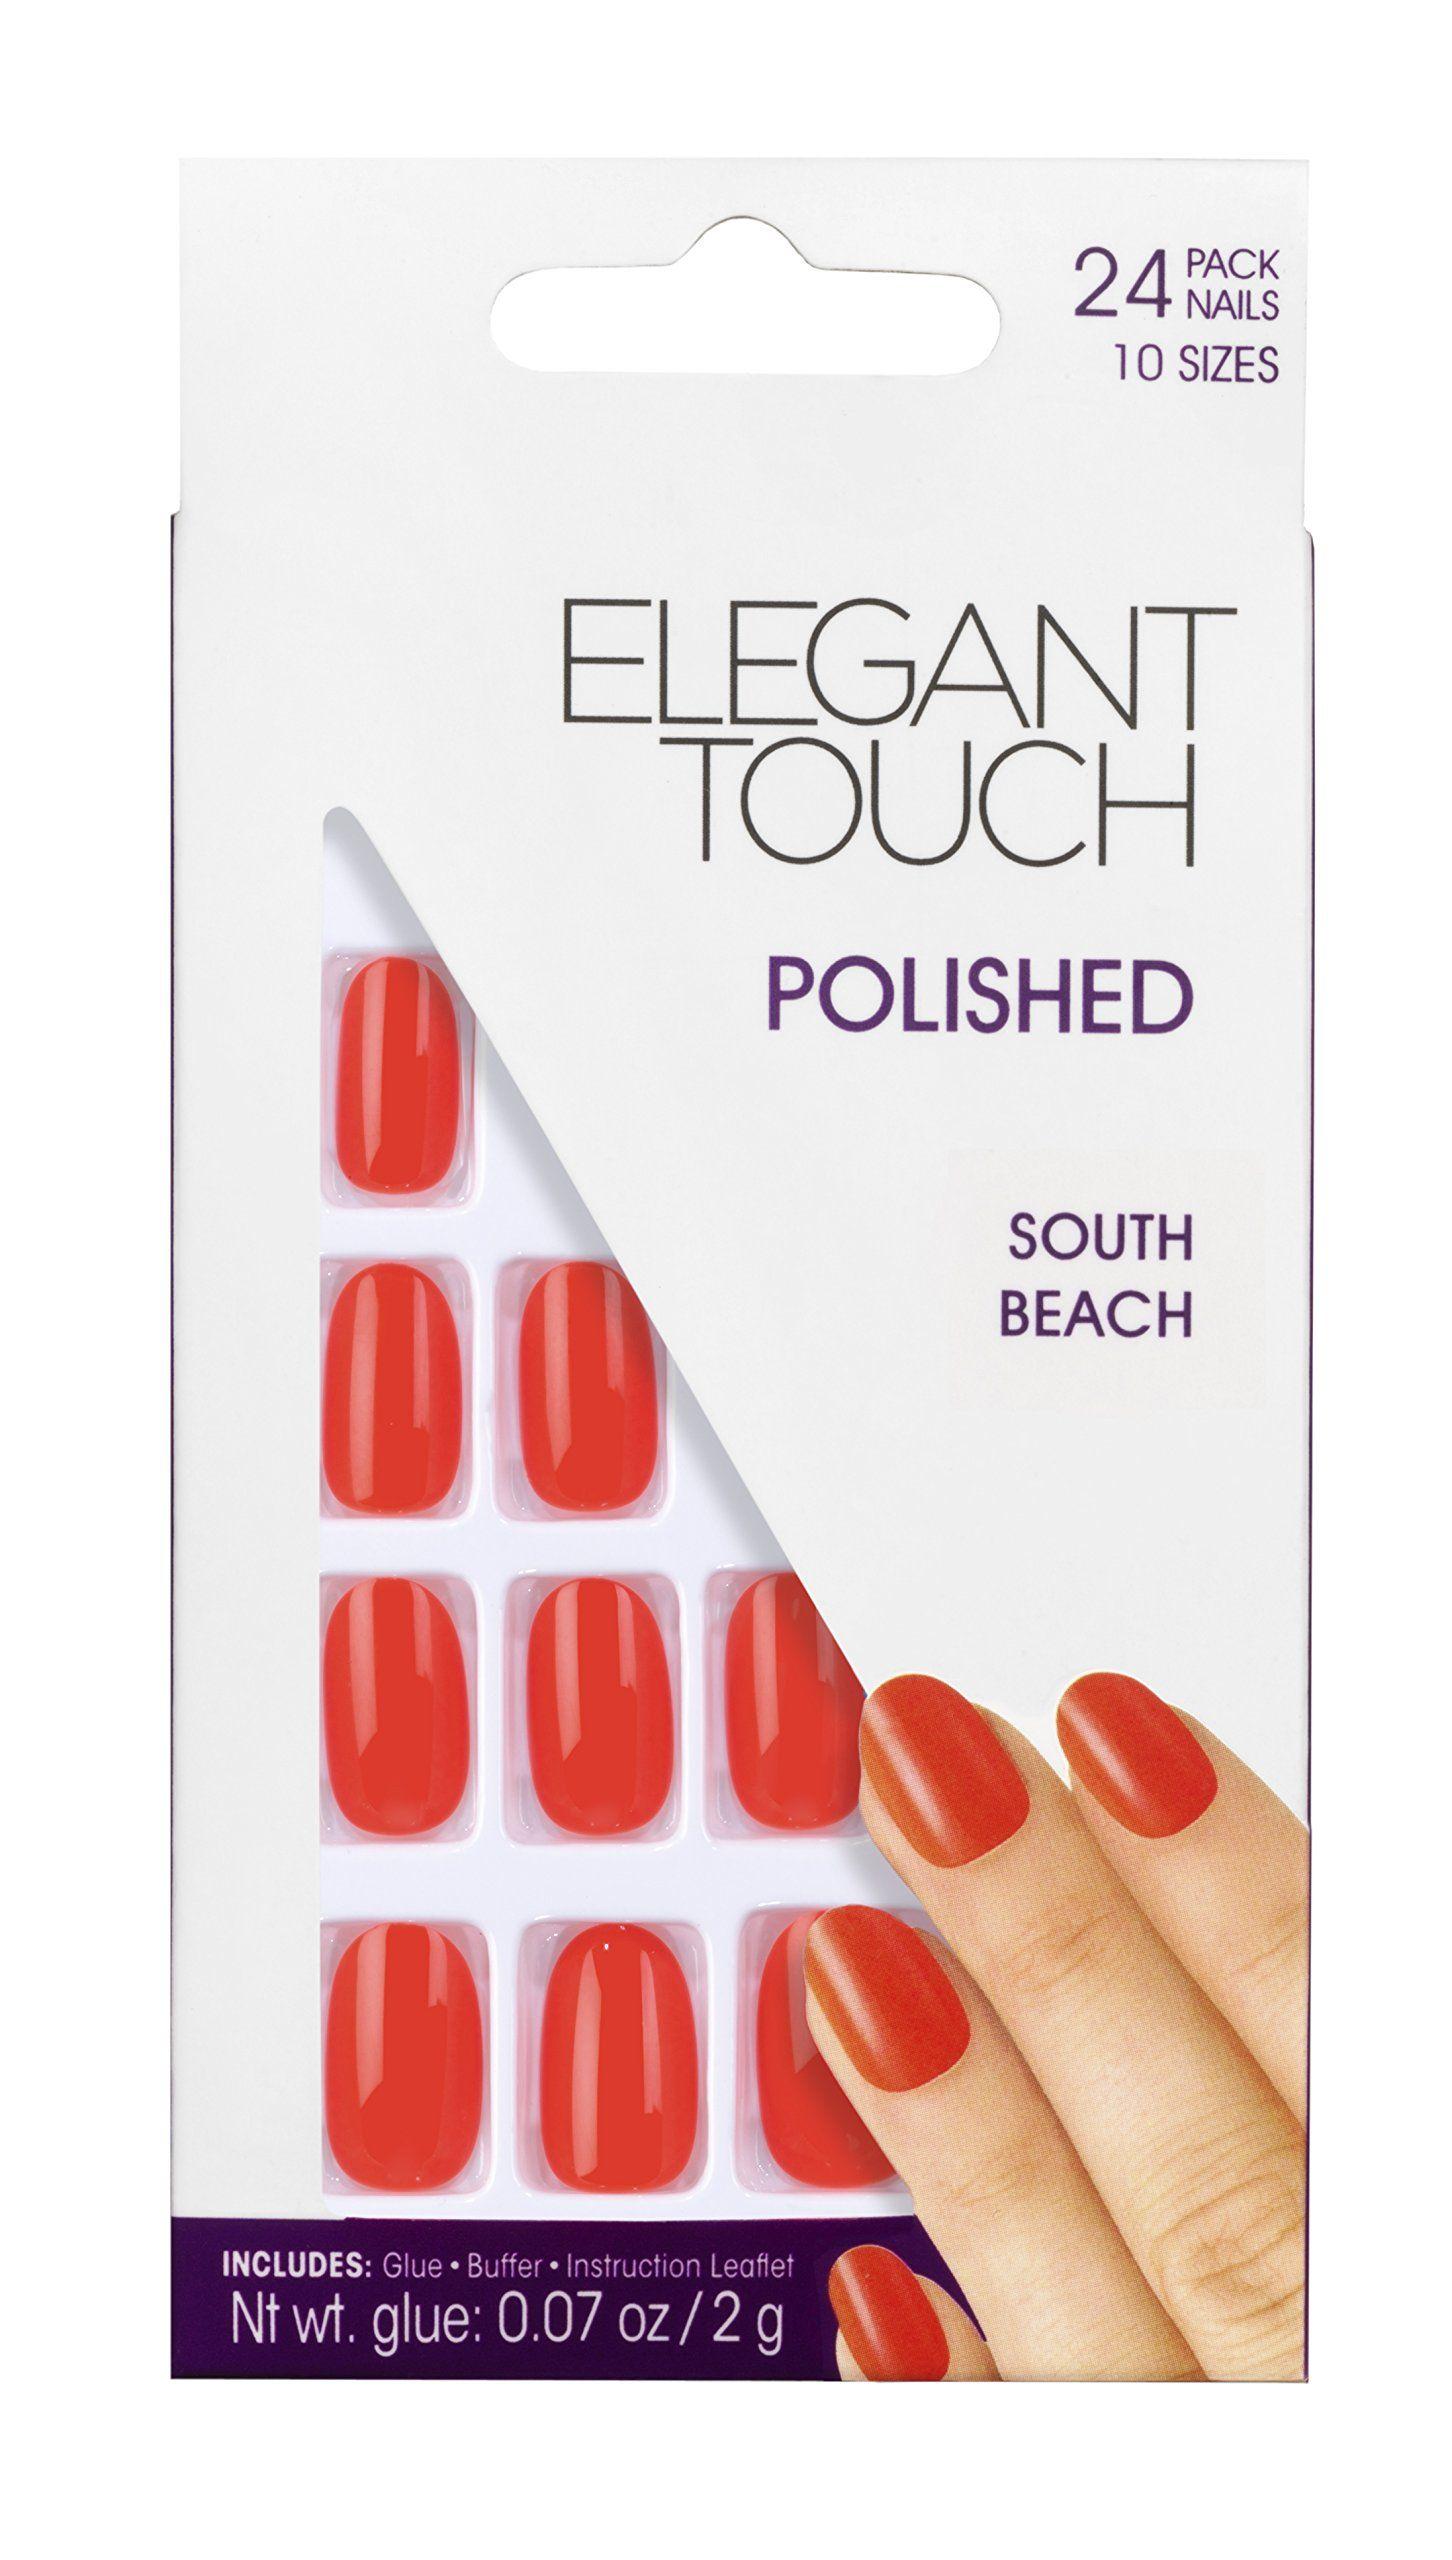 Elegant Touch Polished Nails Ipanema Collection, South Beach Orange: Amazon.co.uk: Beauty